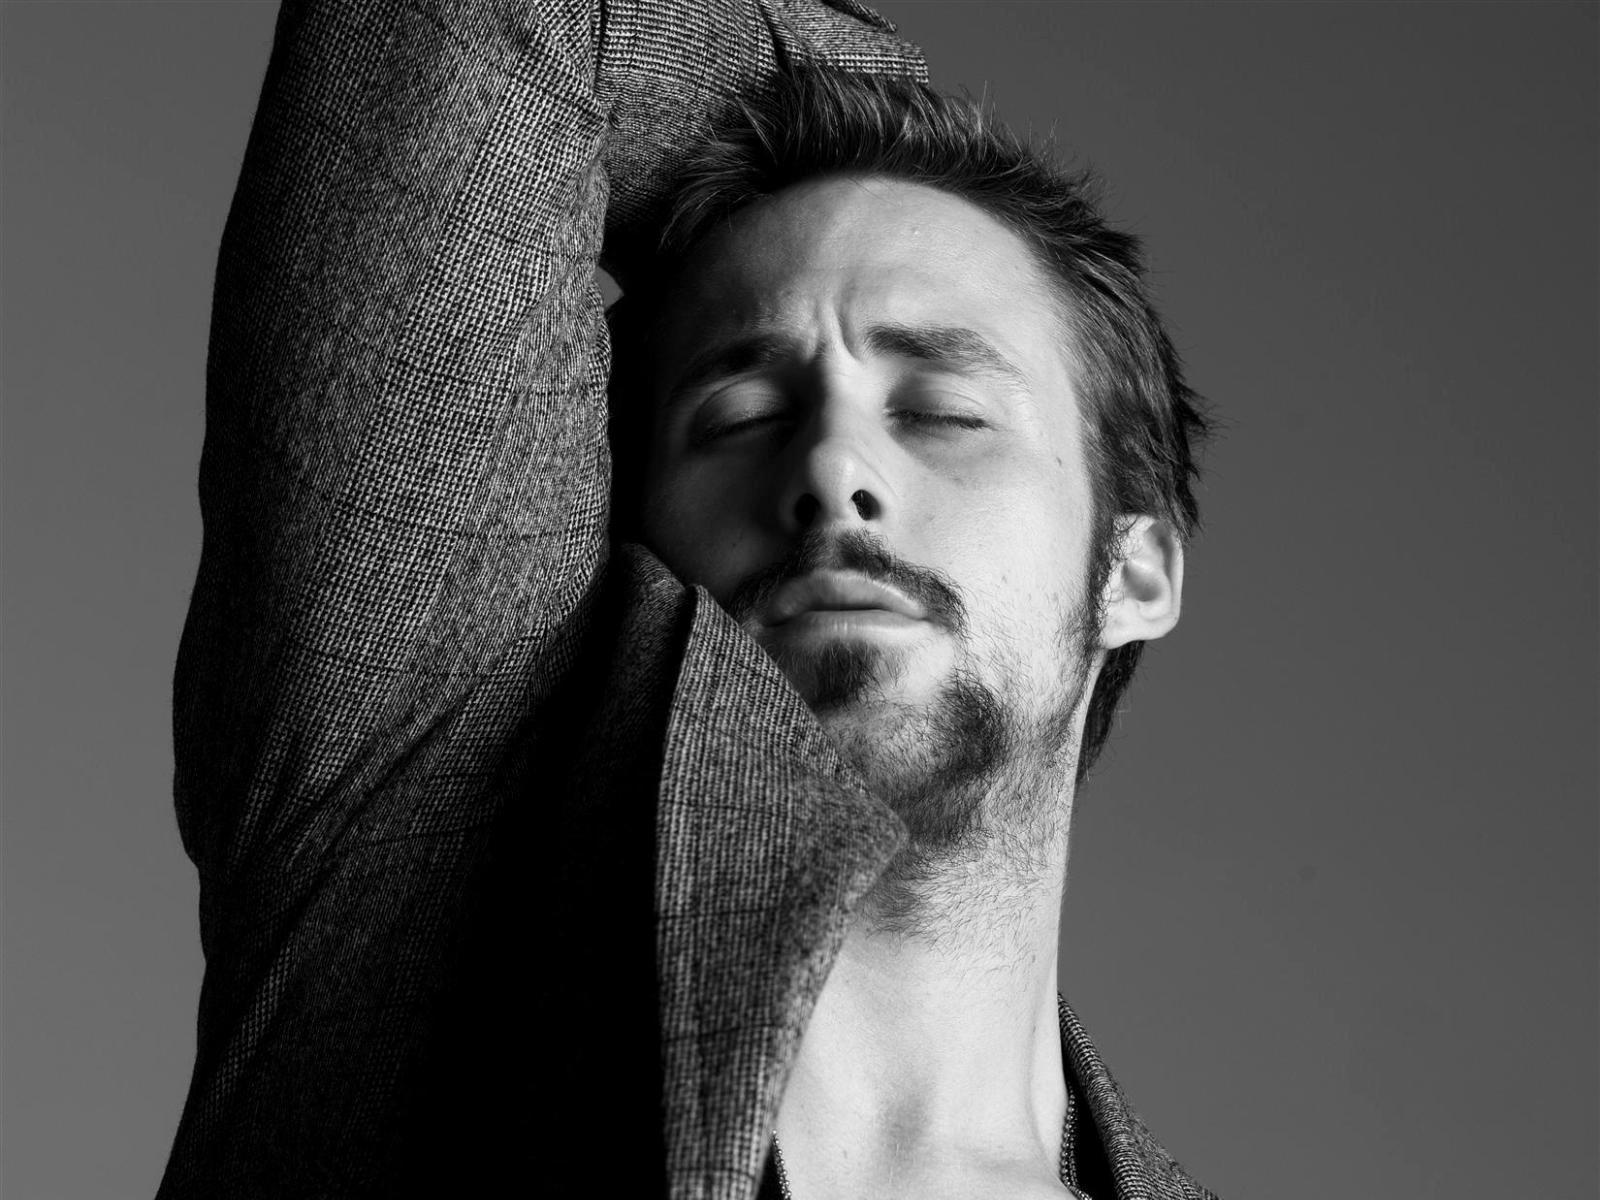 Ryan Gosling Wallpapers August 2012 1600x1200